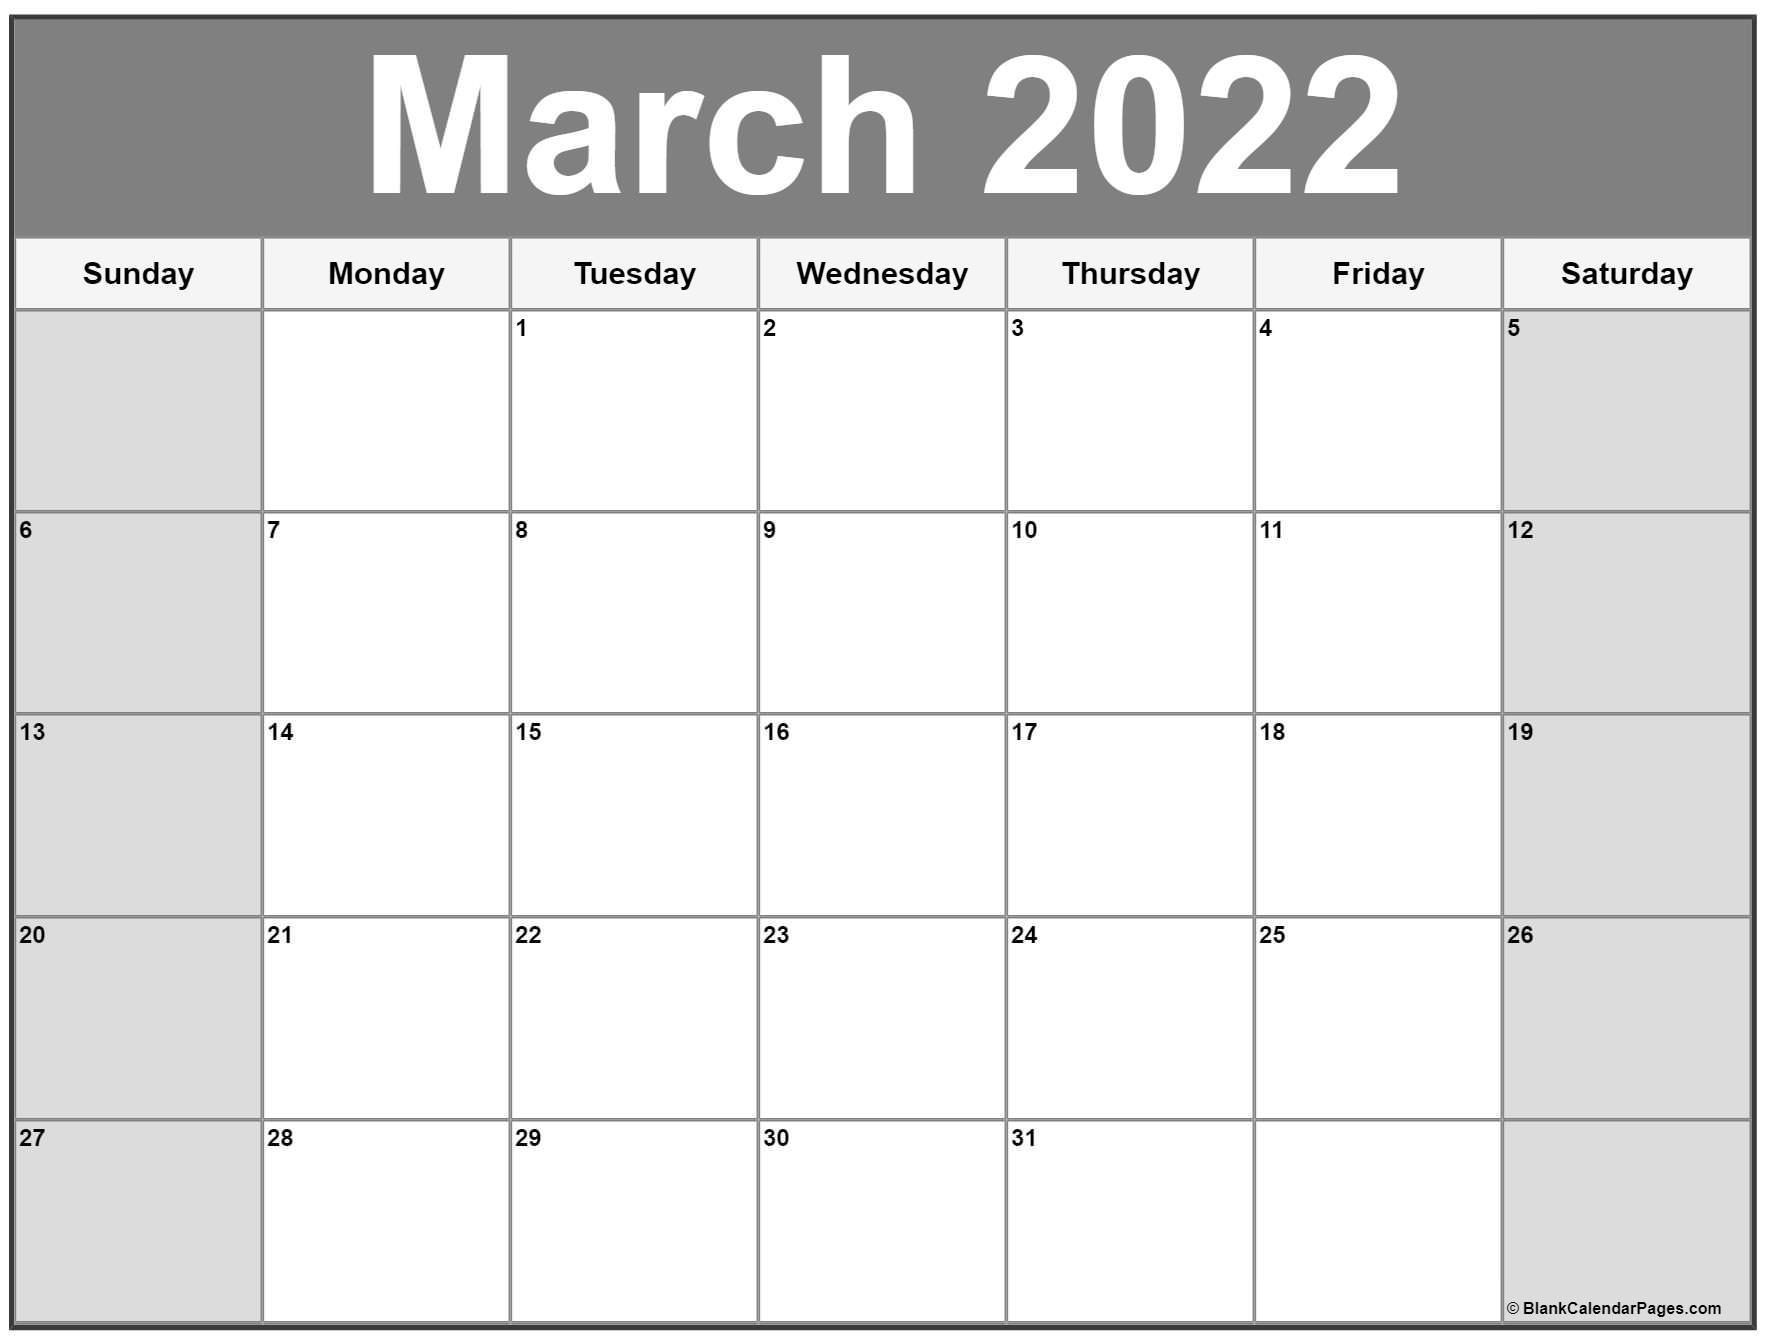 March 2022 Calendar | Free Printable Calendar Templates inside Everyday Is A Holiday Calendar 2022